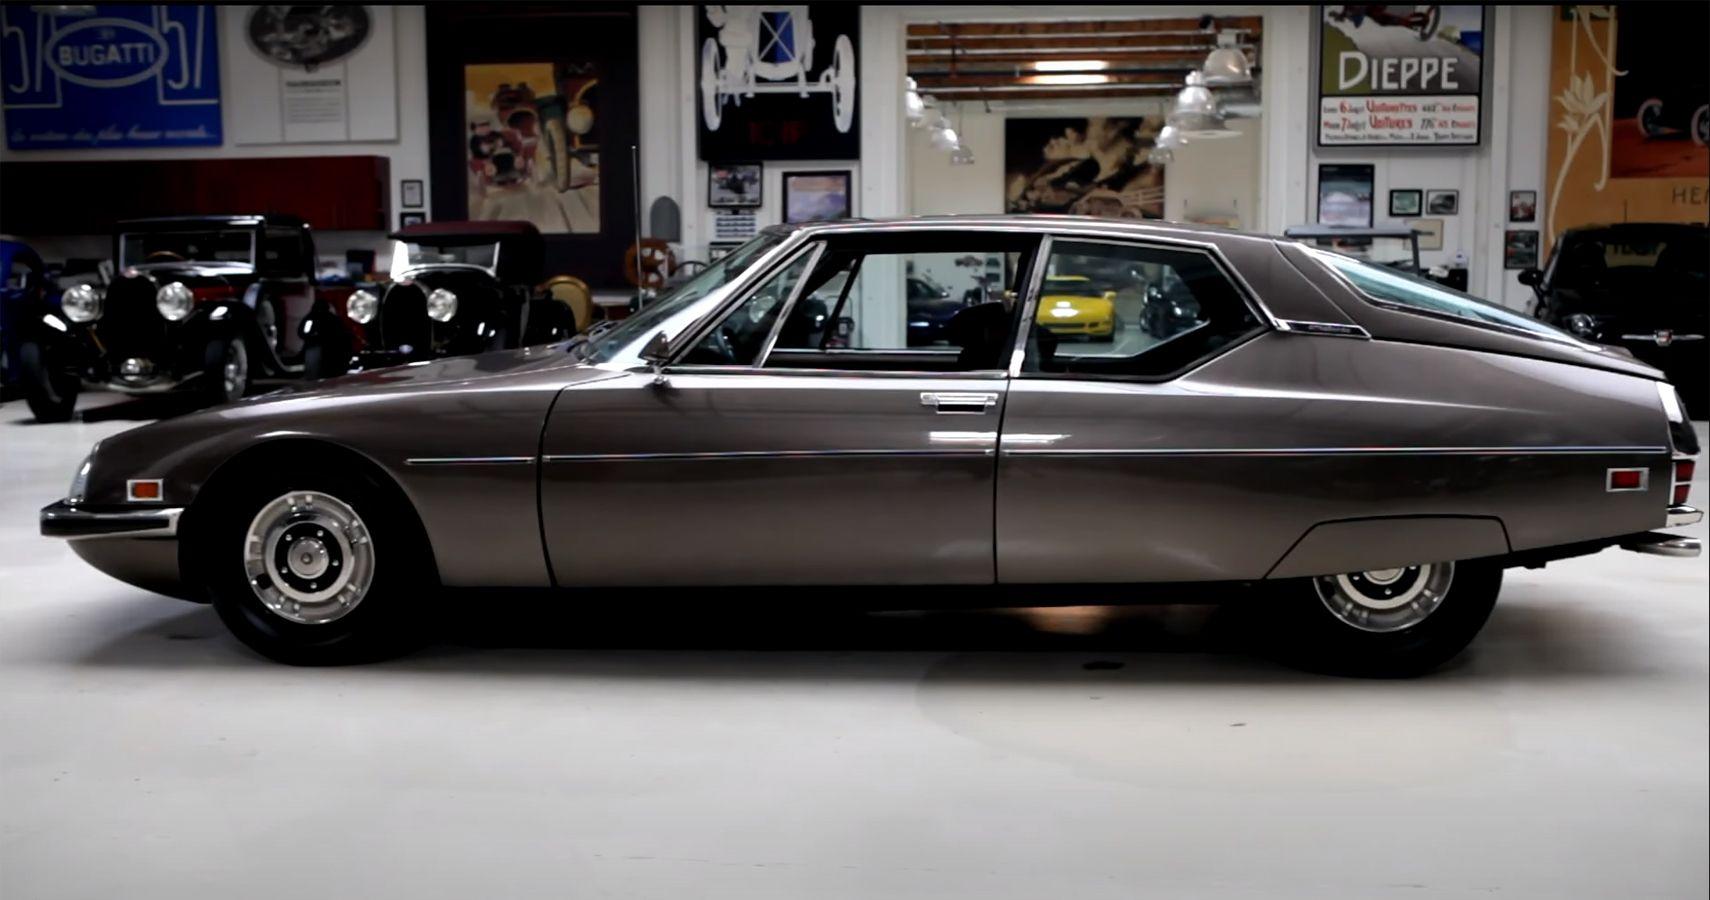 Jay Leno Goes Futuristic In His 1972 Citroën SM Sedan | HotCars